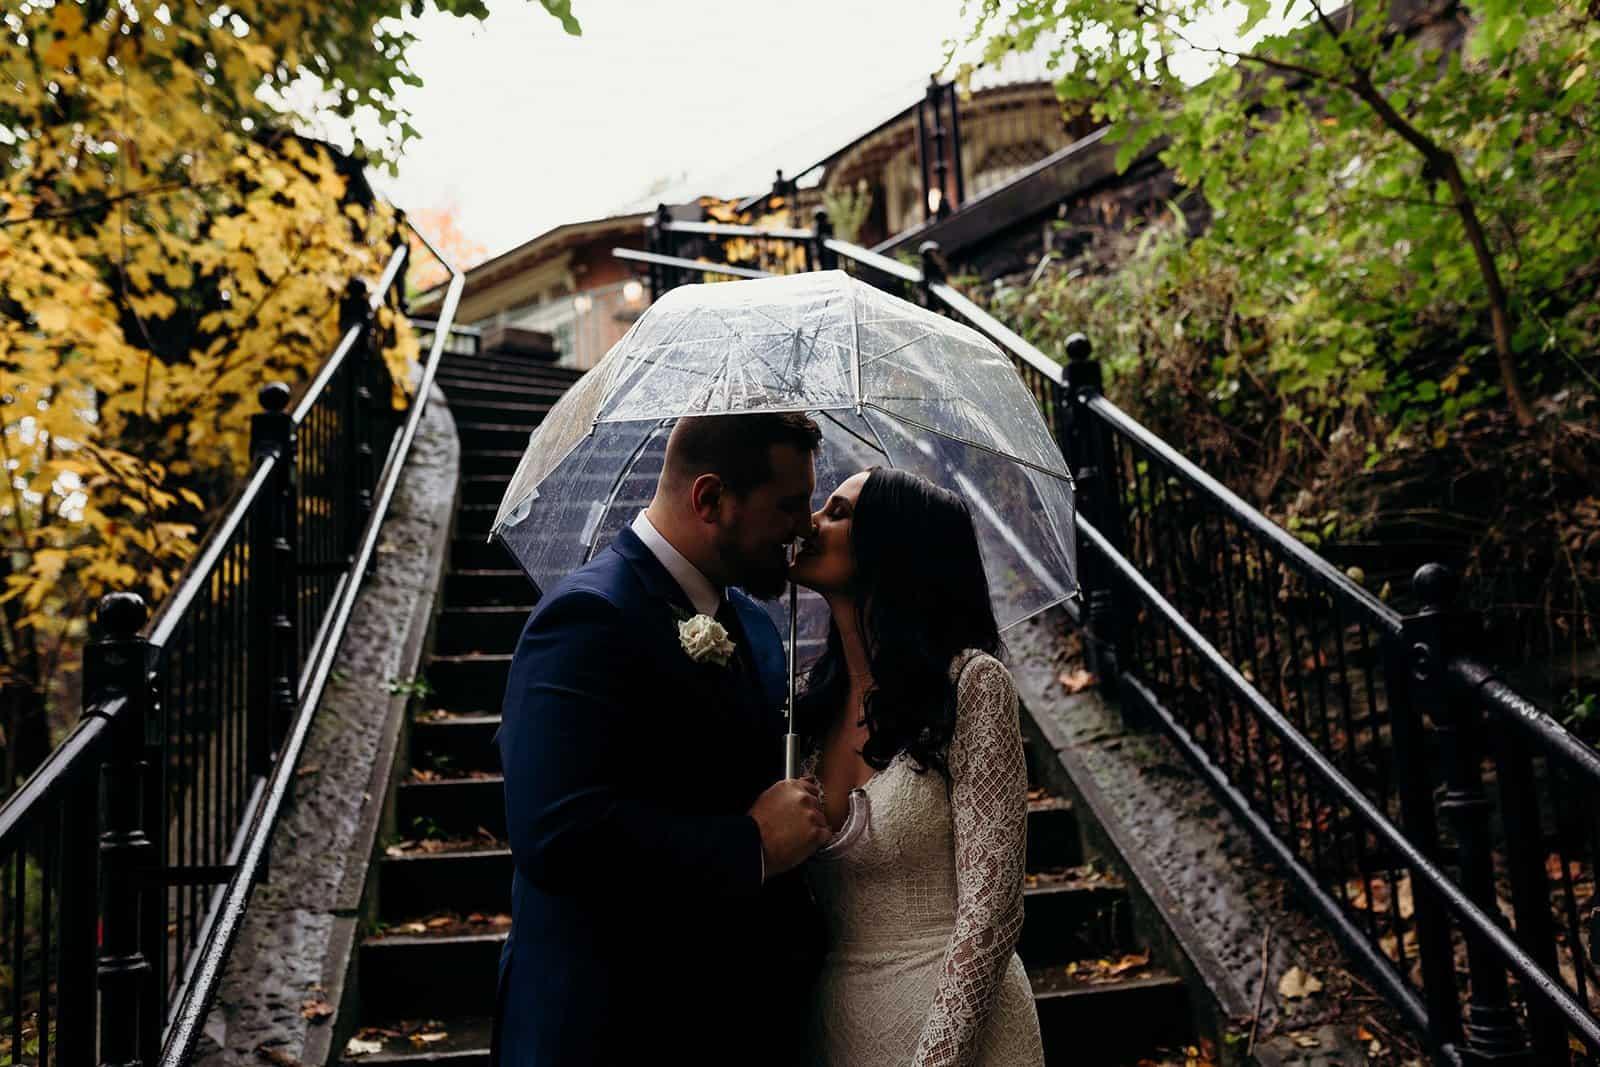 Husband and wife kiss under umbrella